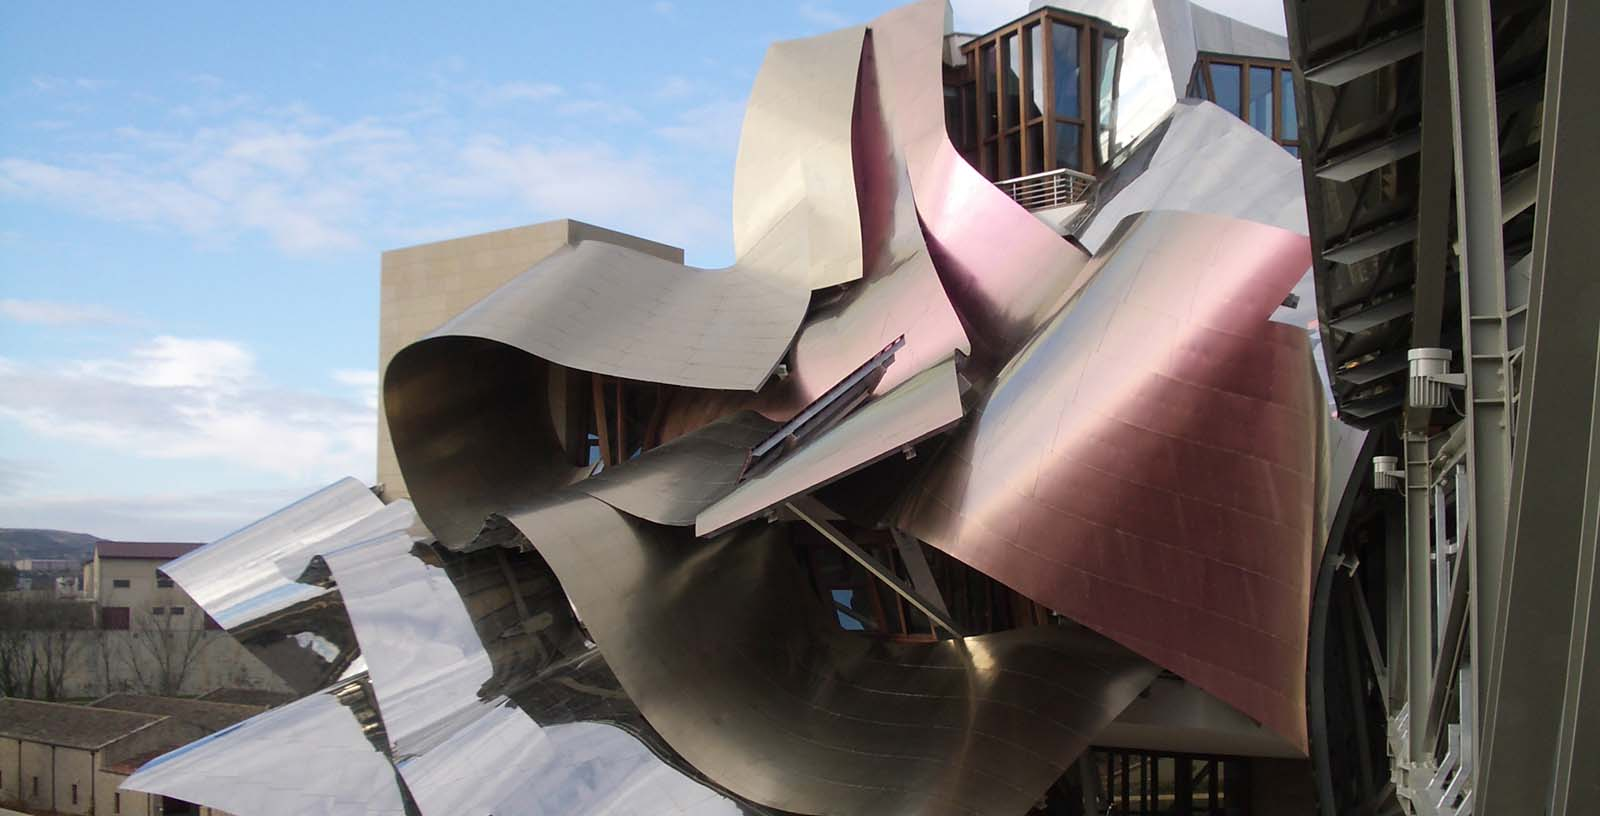 Marques_de_Riscal_hotel_03_Building_Idom_Idom